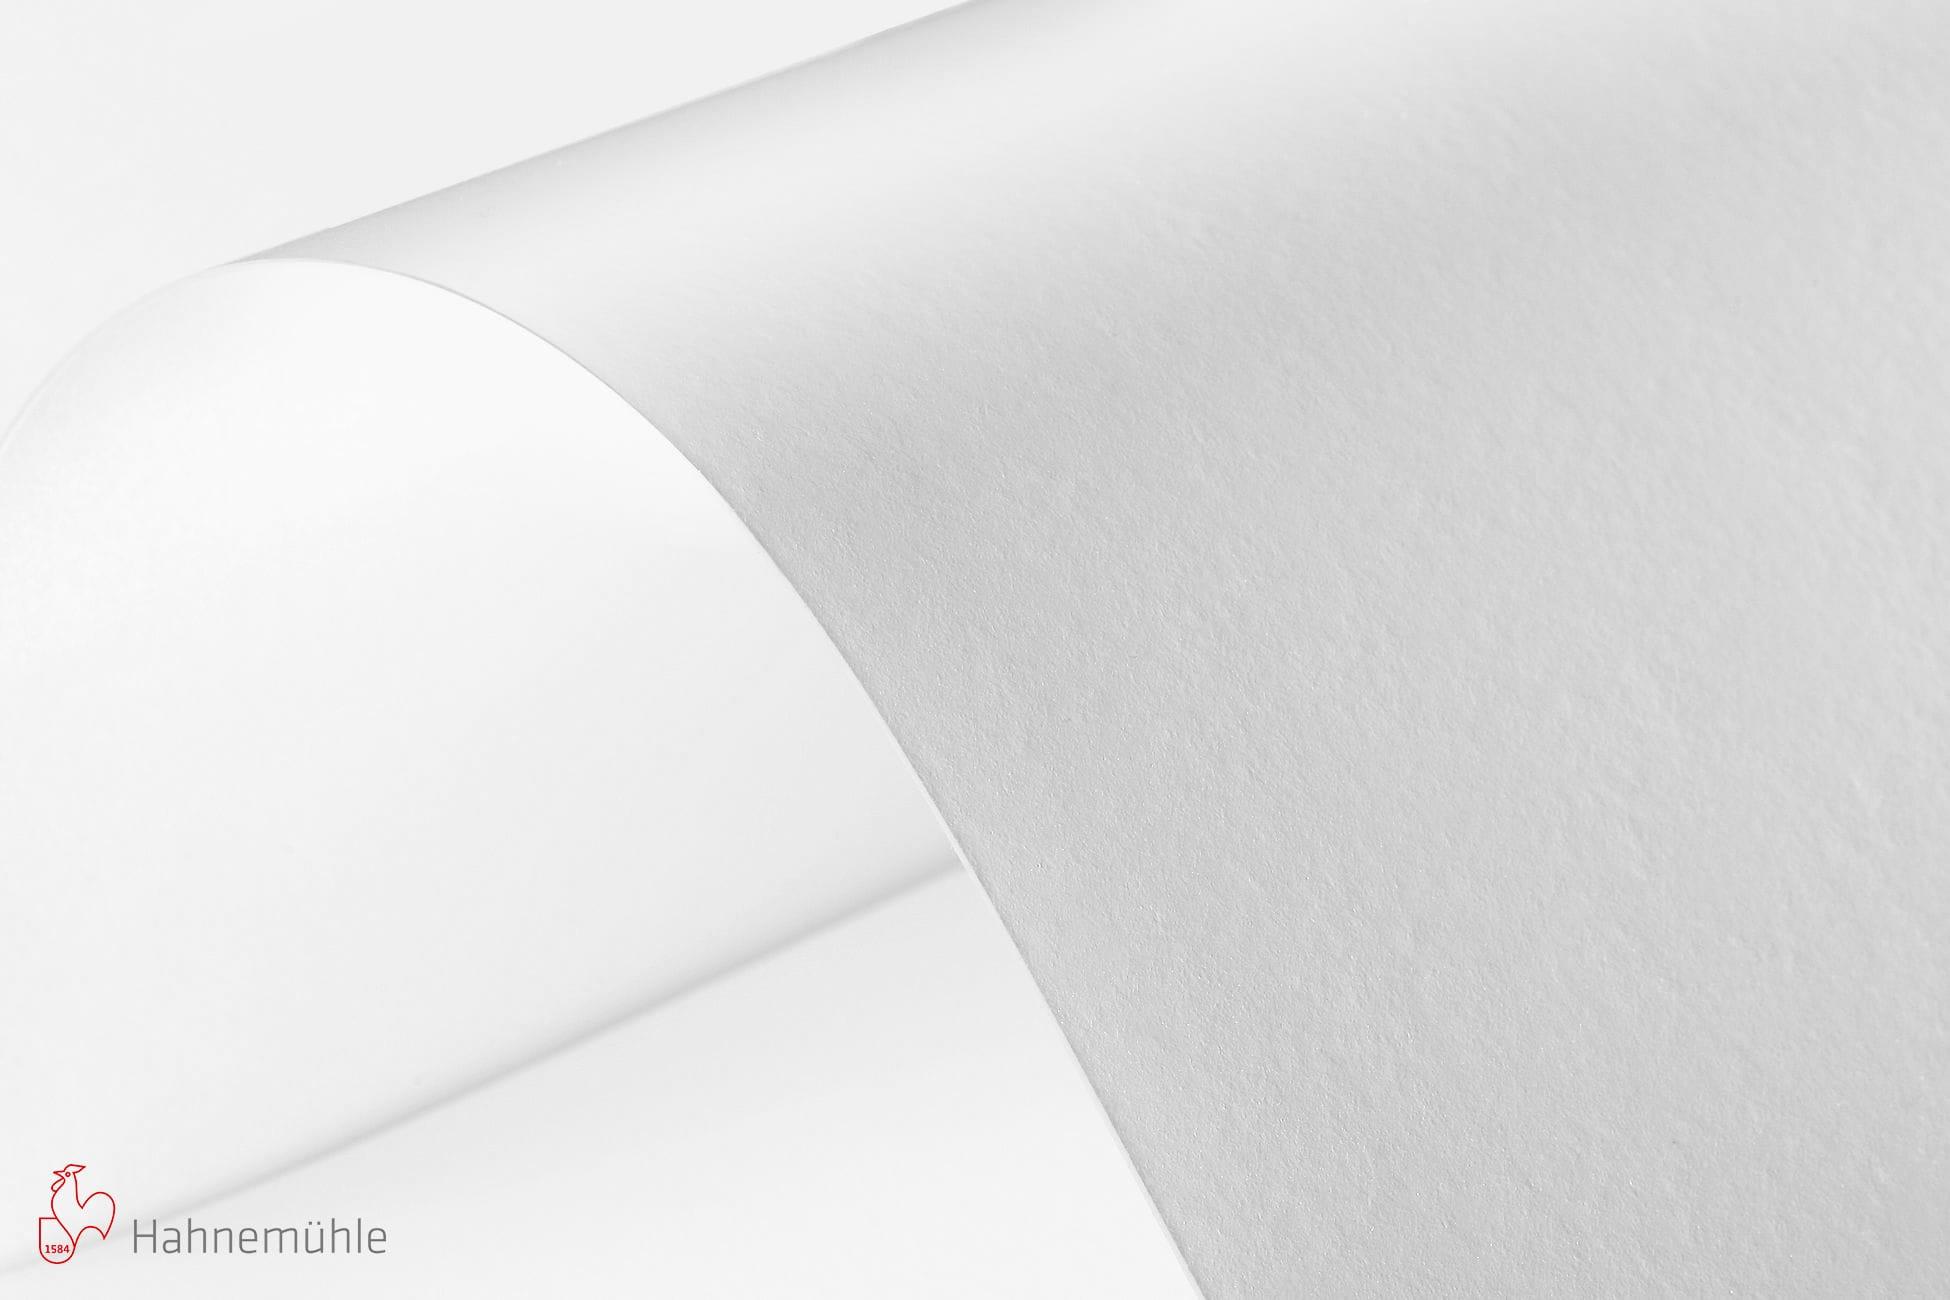 Hahnemuhle-FineArt-Pearl-285gsm.jpg